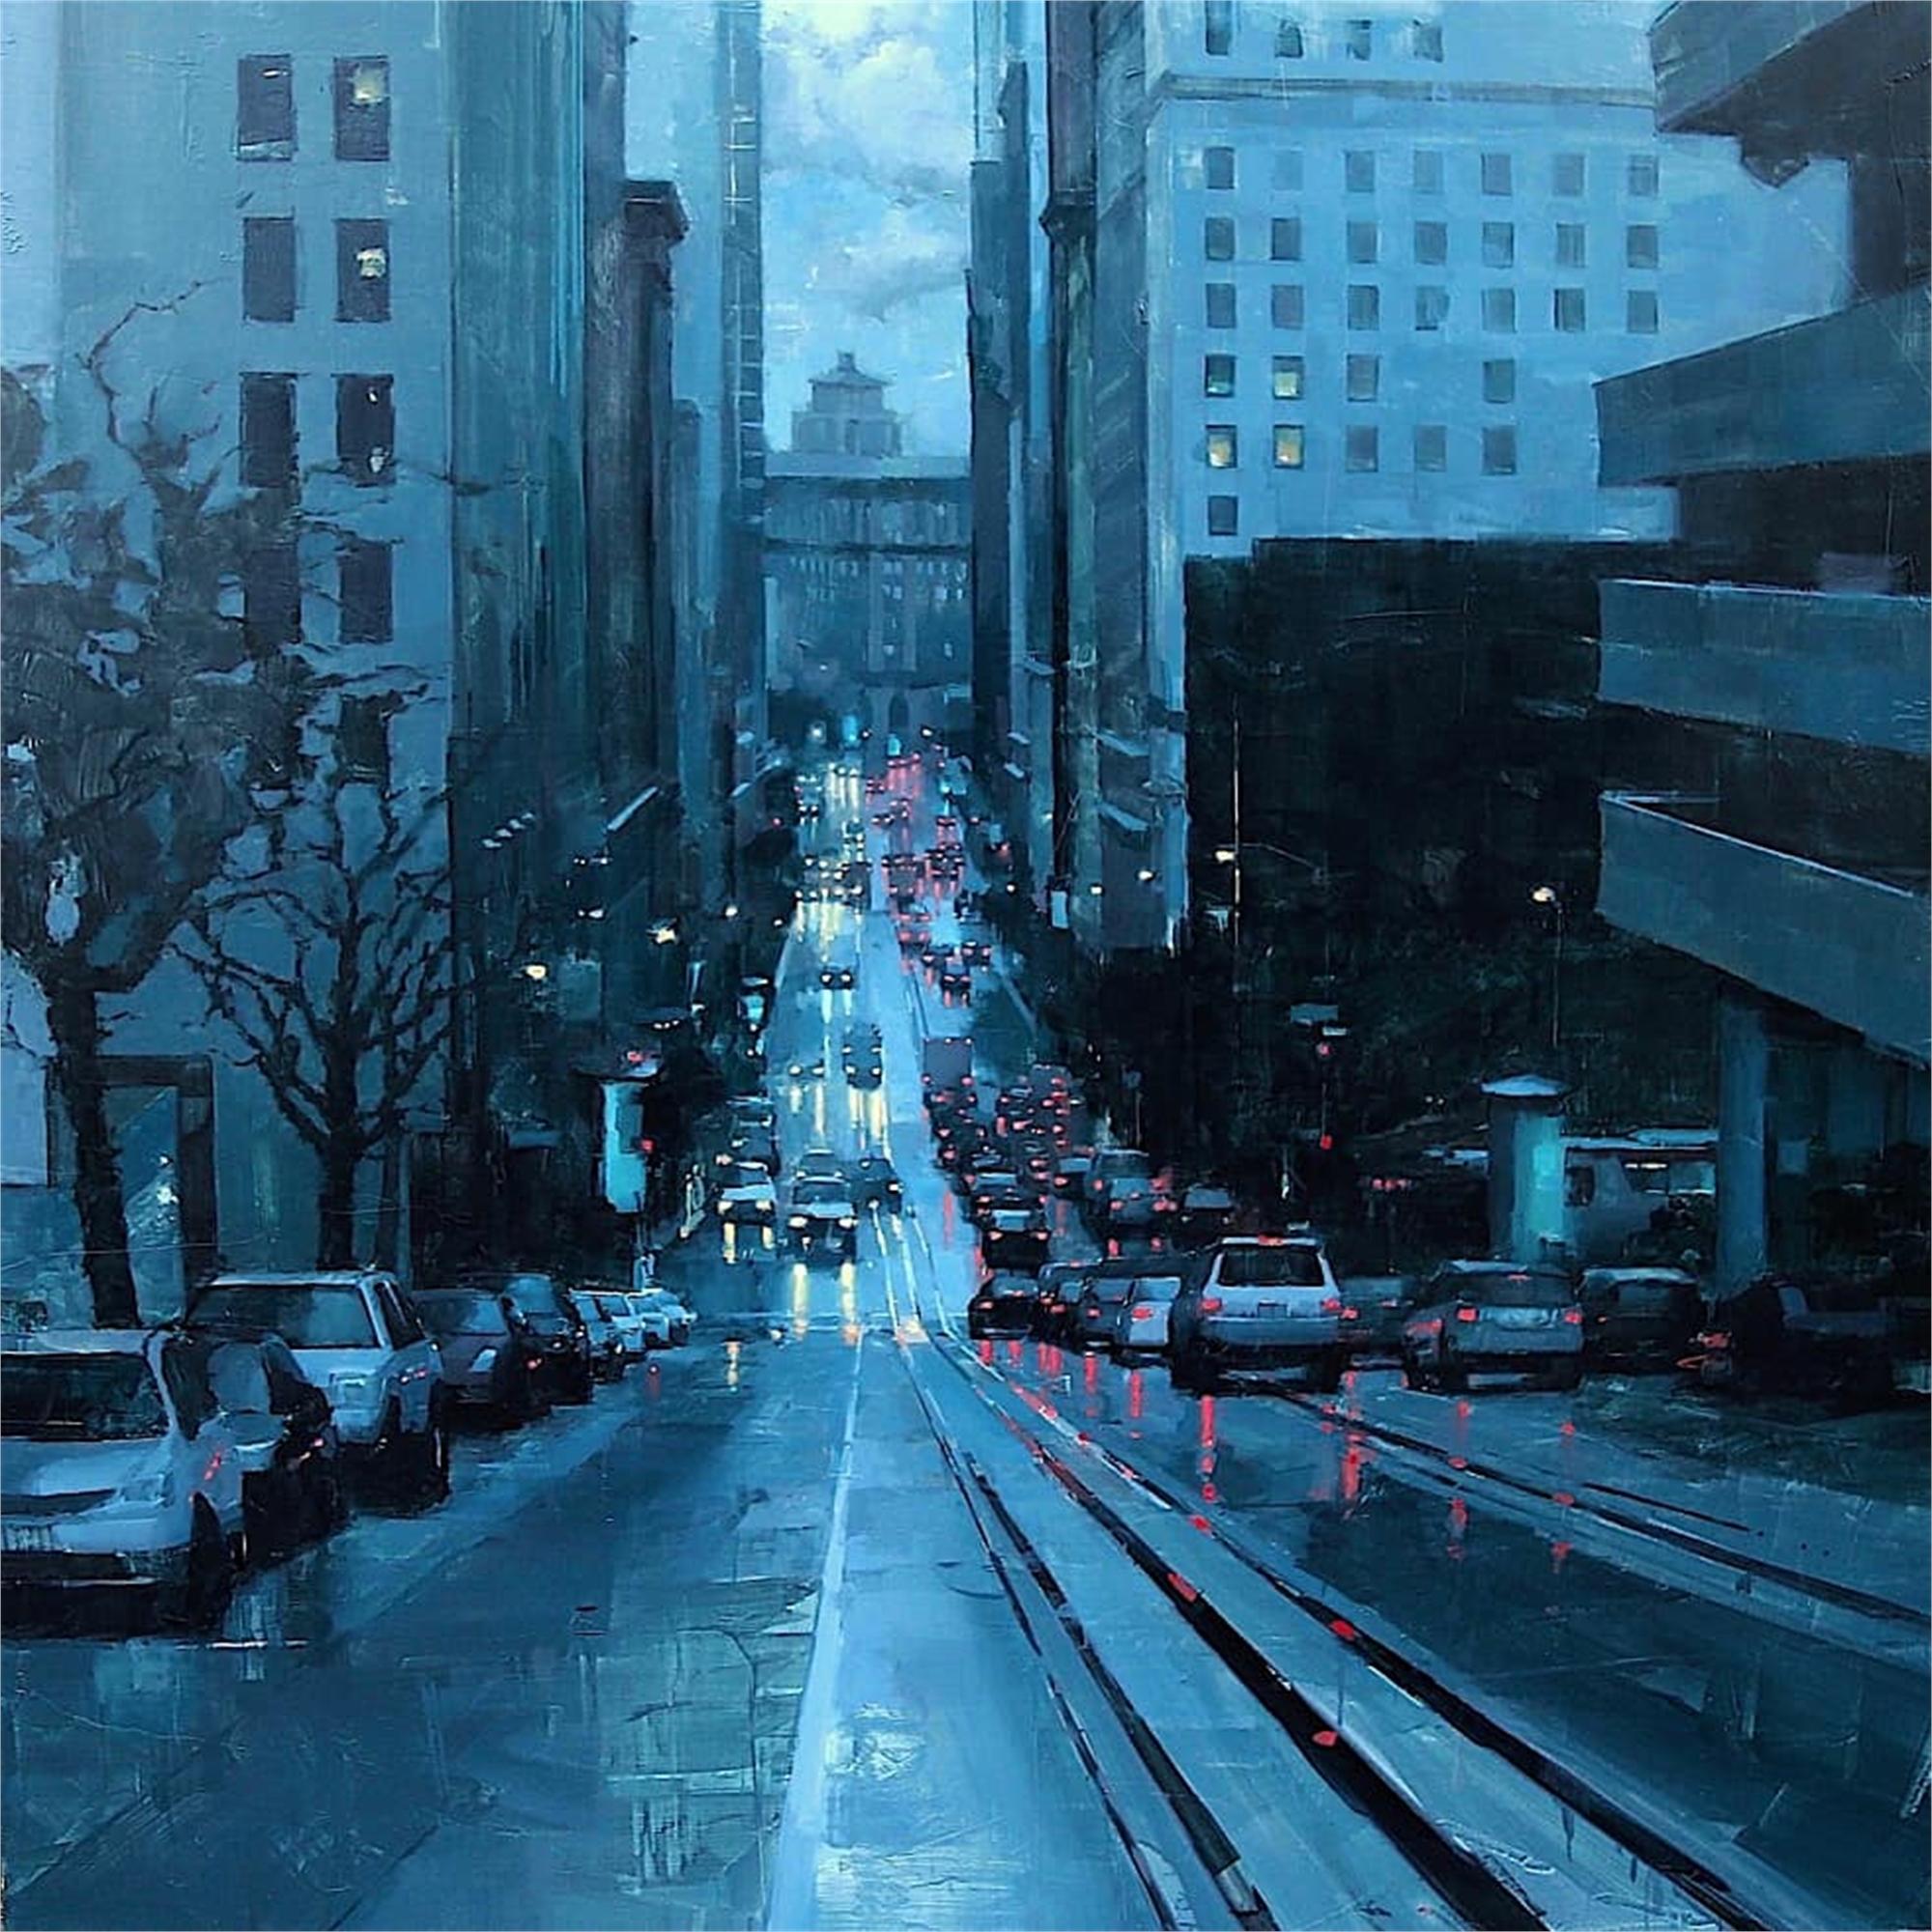 Winter Light, SF by James Kroner